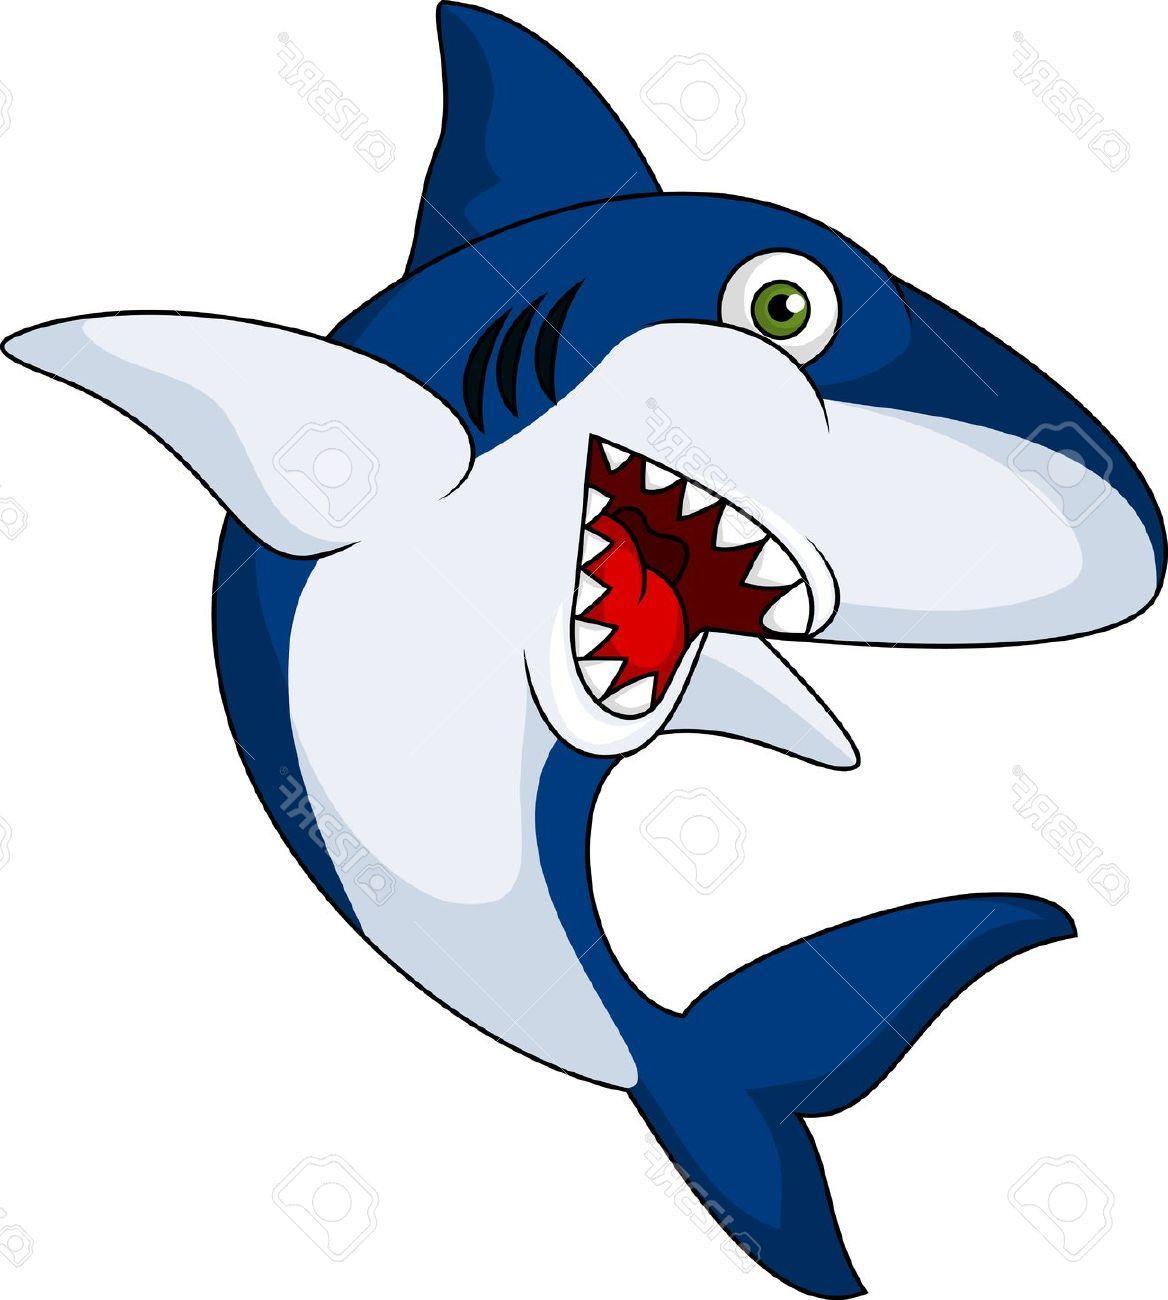 1168x1300 Hd Smiling Shark Cartoon Stock Vector Image